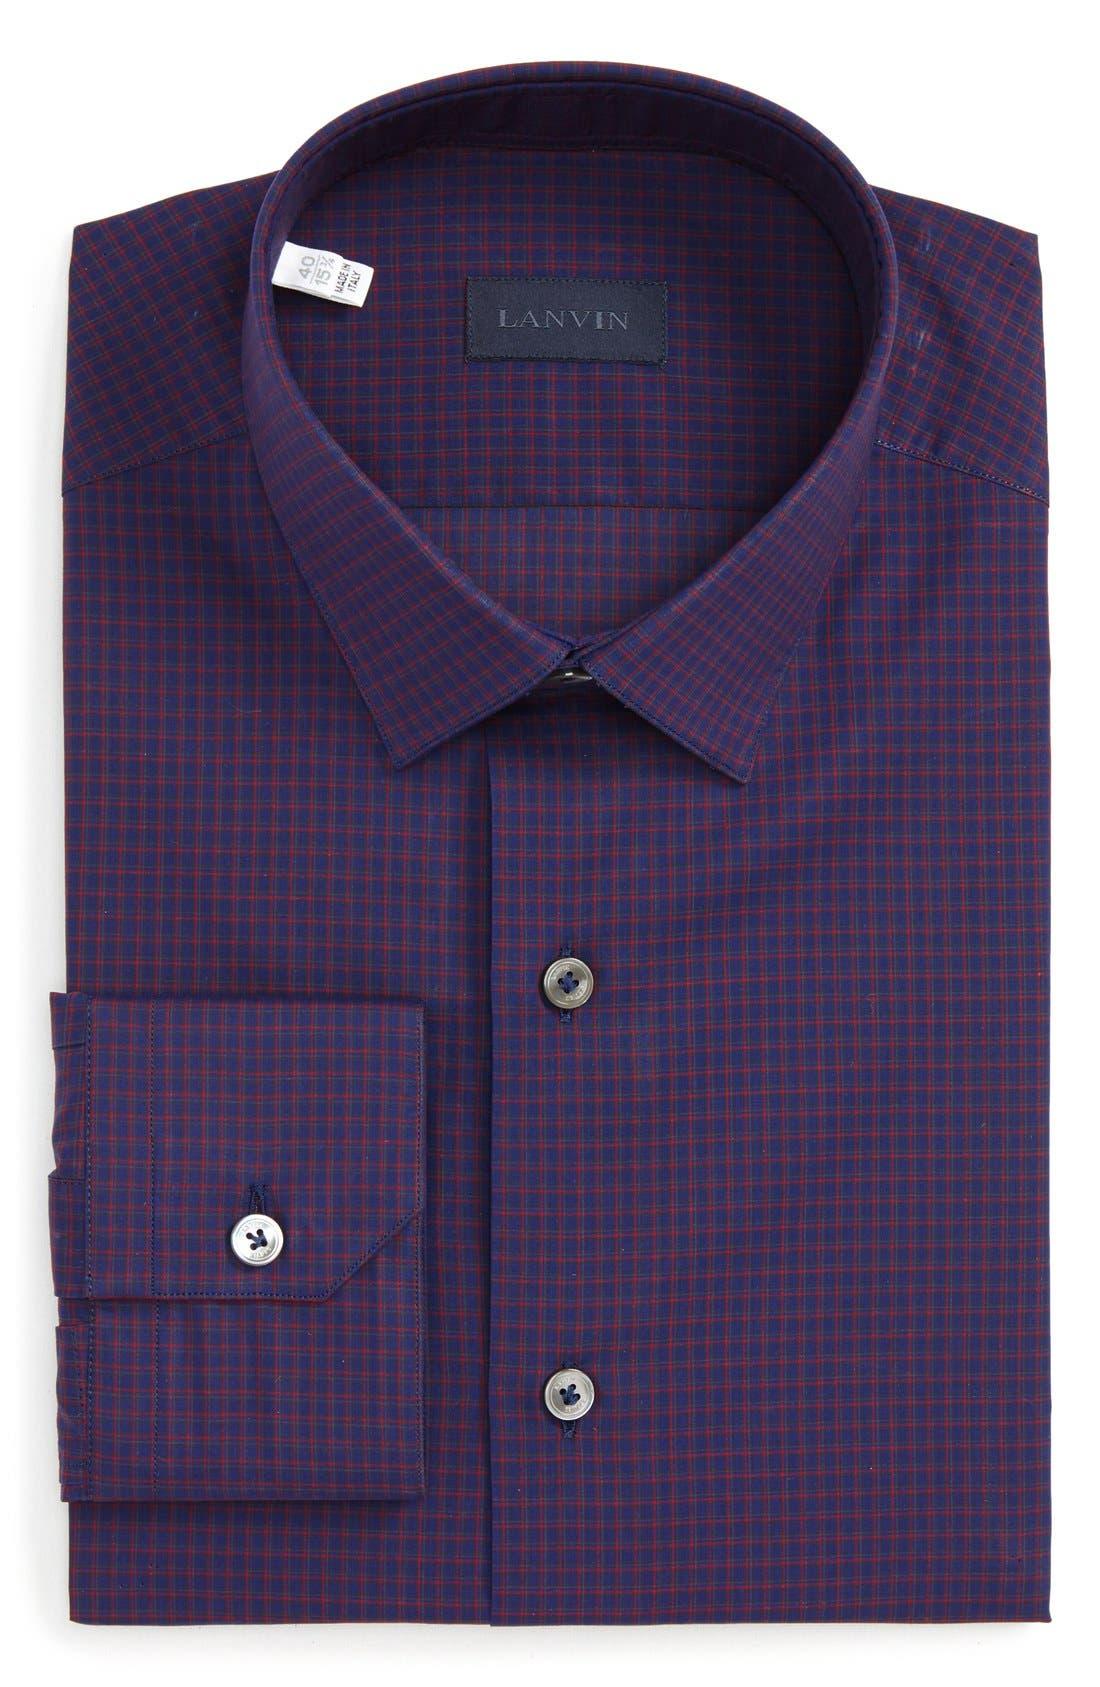 Alternate Image 1 Selected - Lanvin Trim Fit Check Dress Shirt